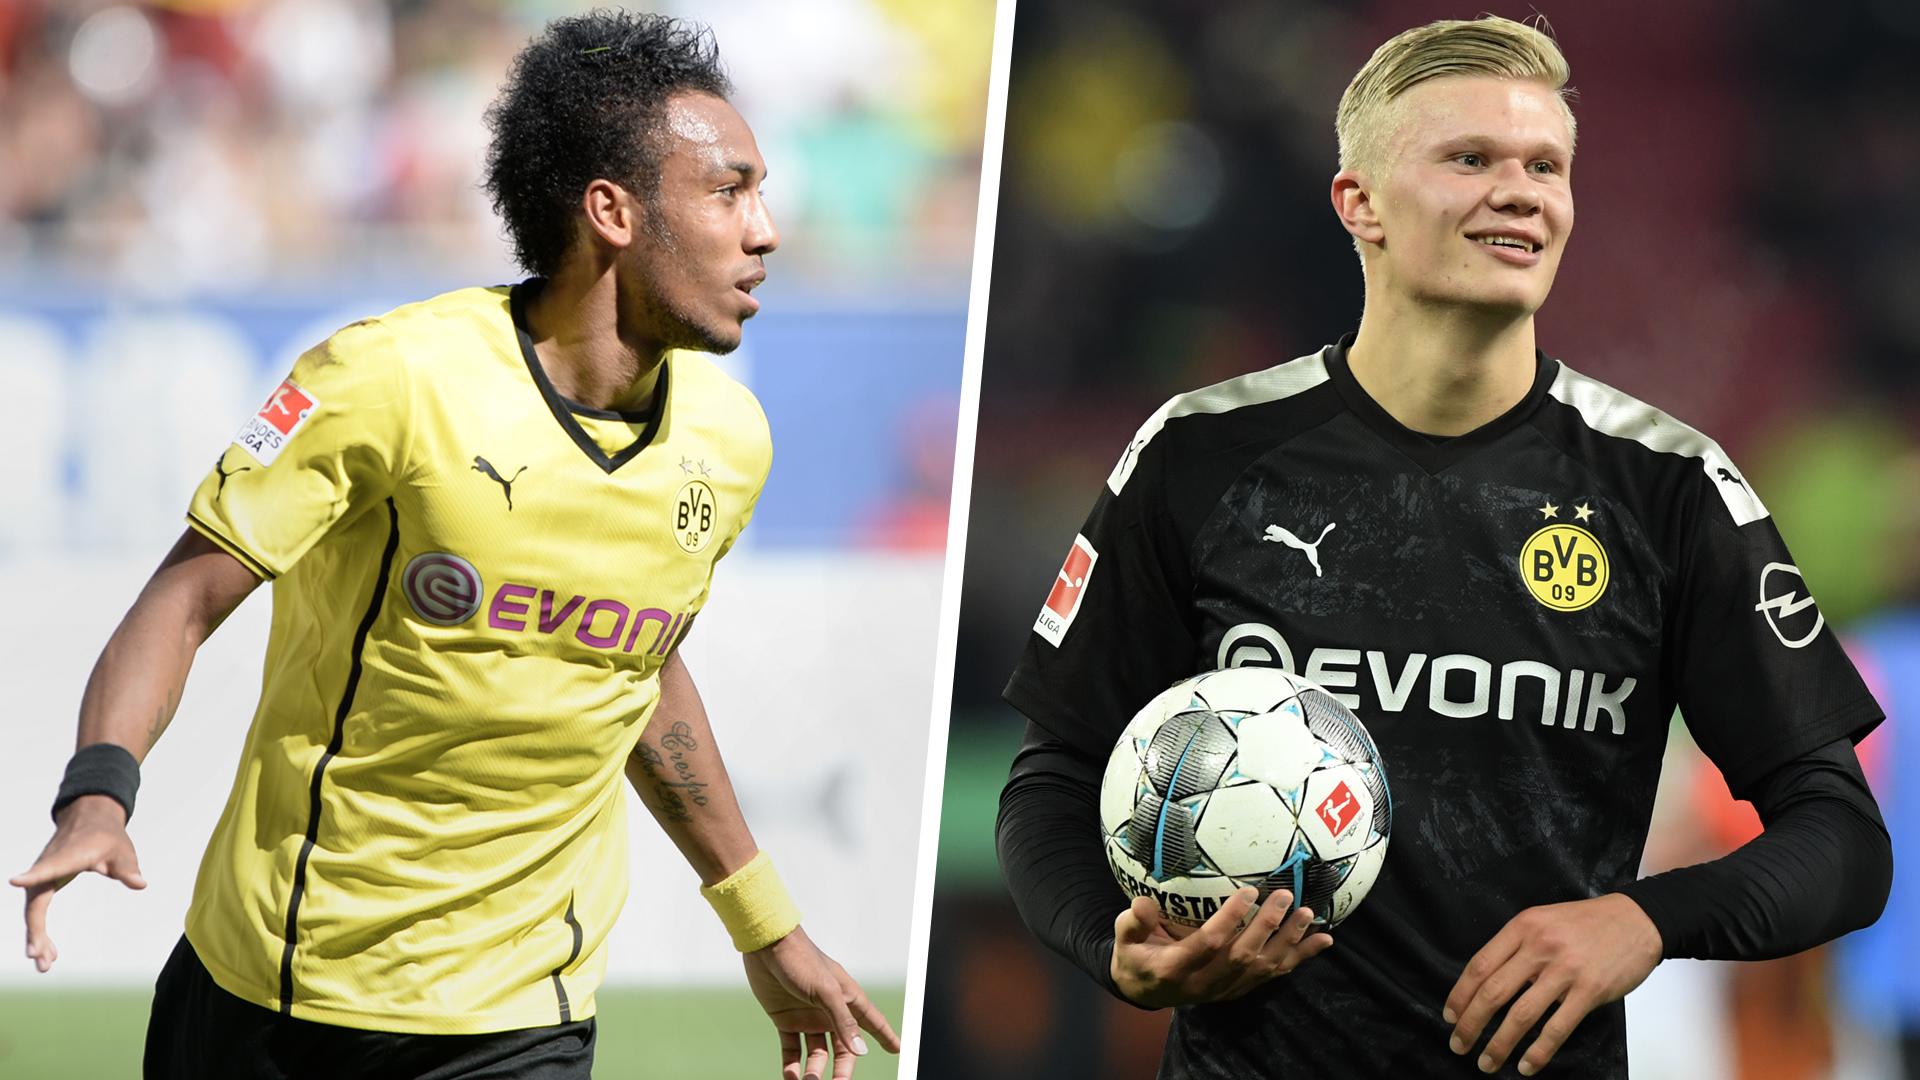 'Haaland is a killer in the Aubameyang mould' – Witsel salutes Borussia Dortmund's teenage sensation